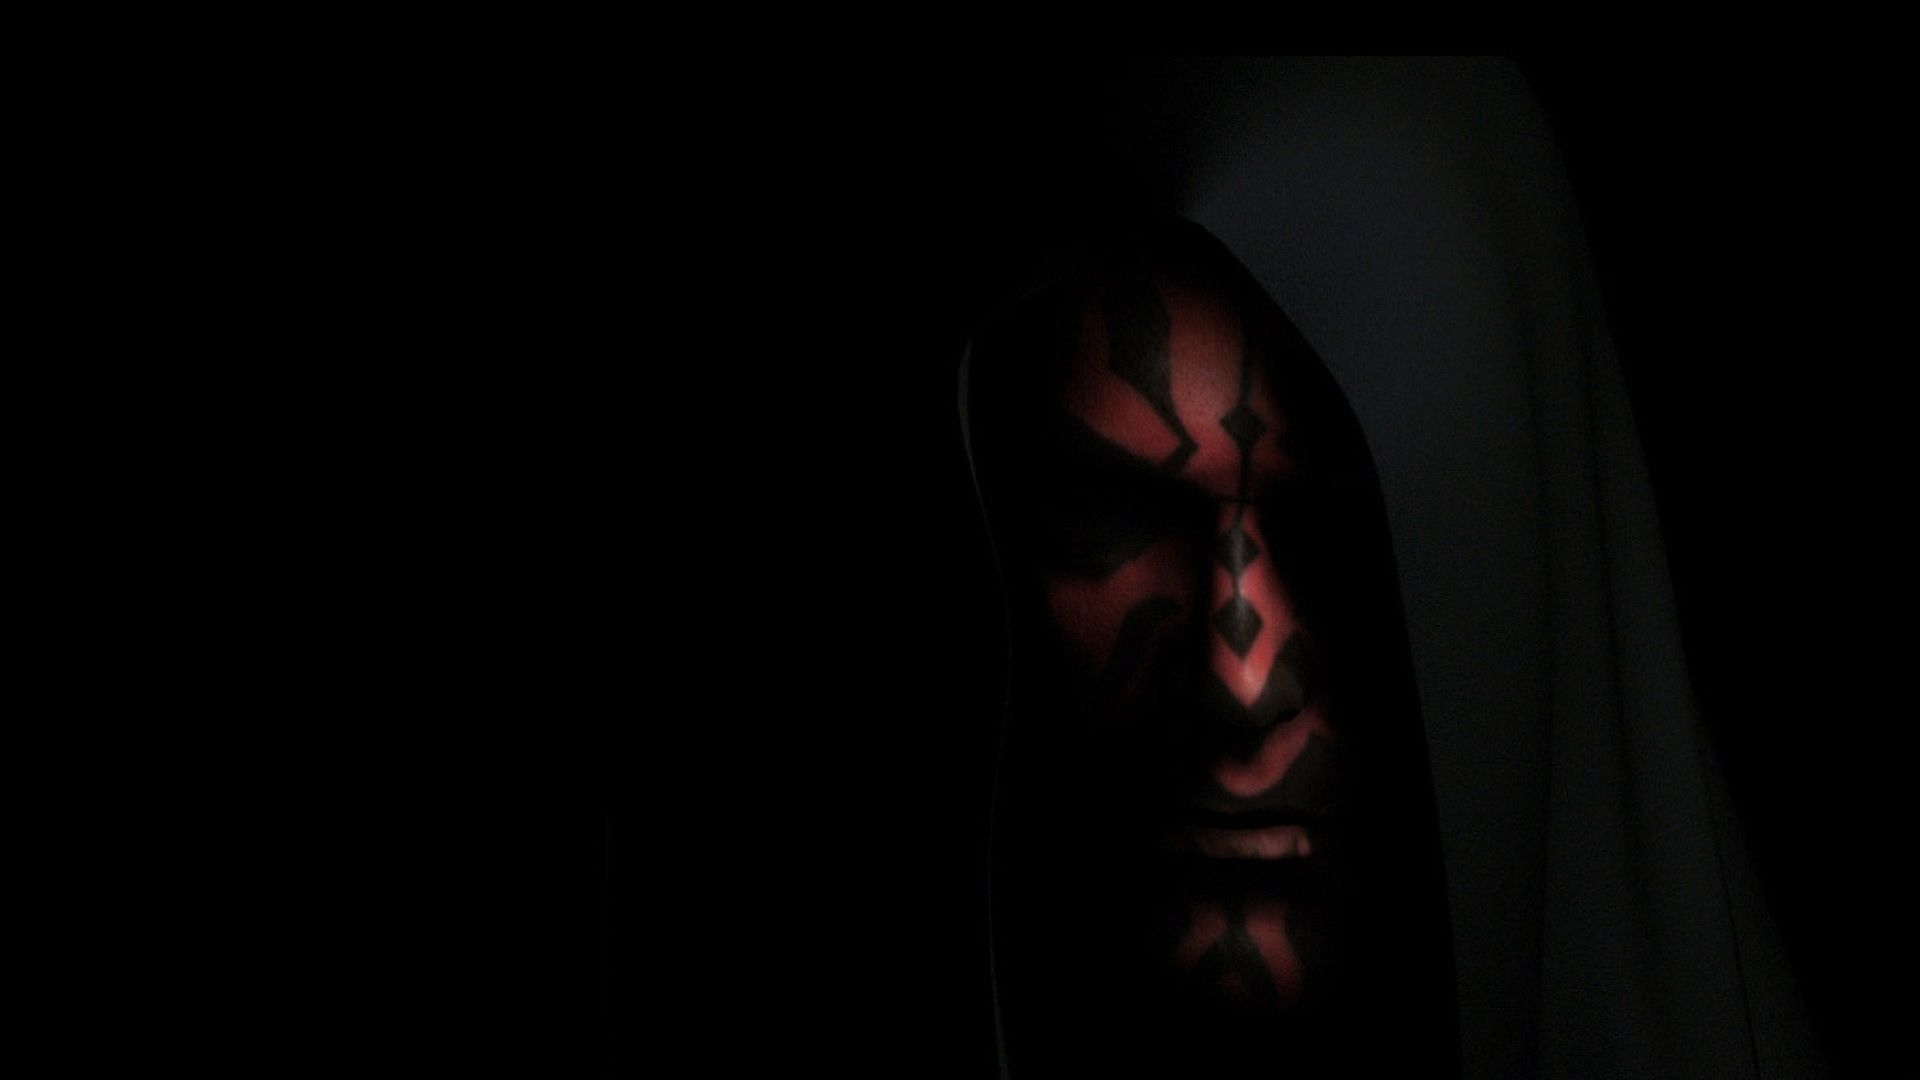 Star Wars Dark Wallpapers Top Free Star Wars Dark Backgrounds